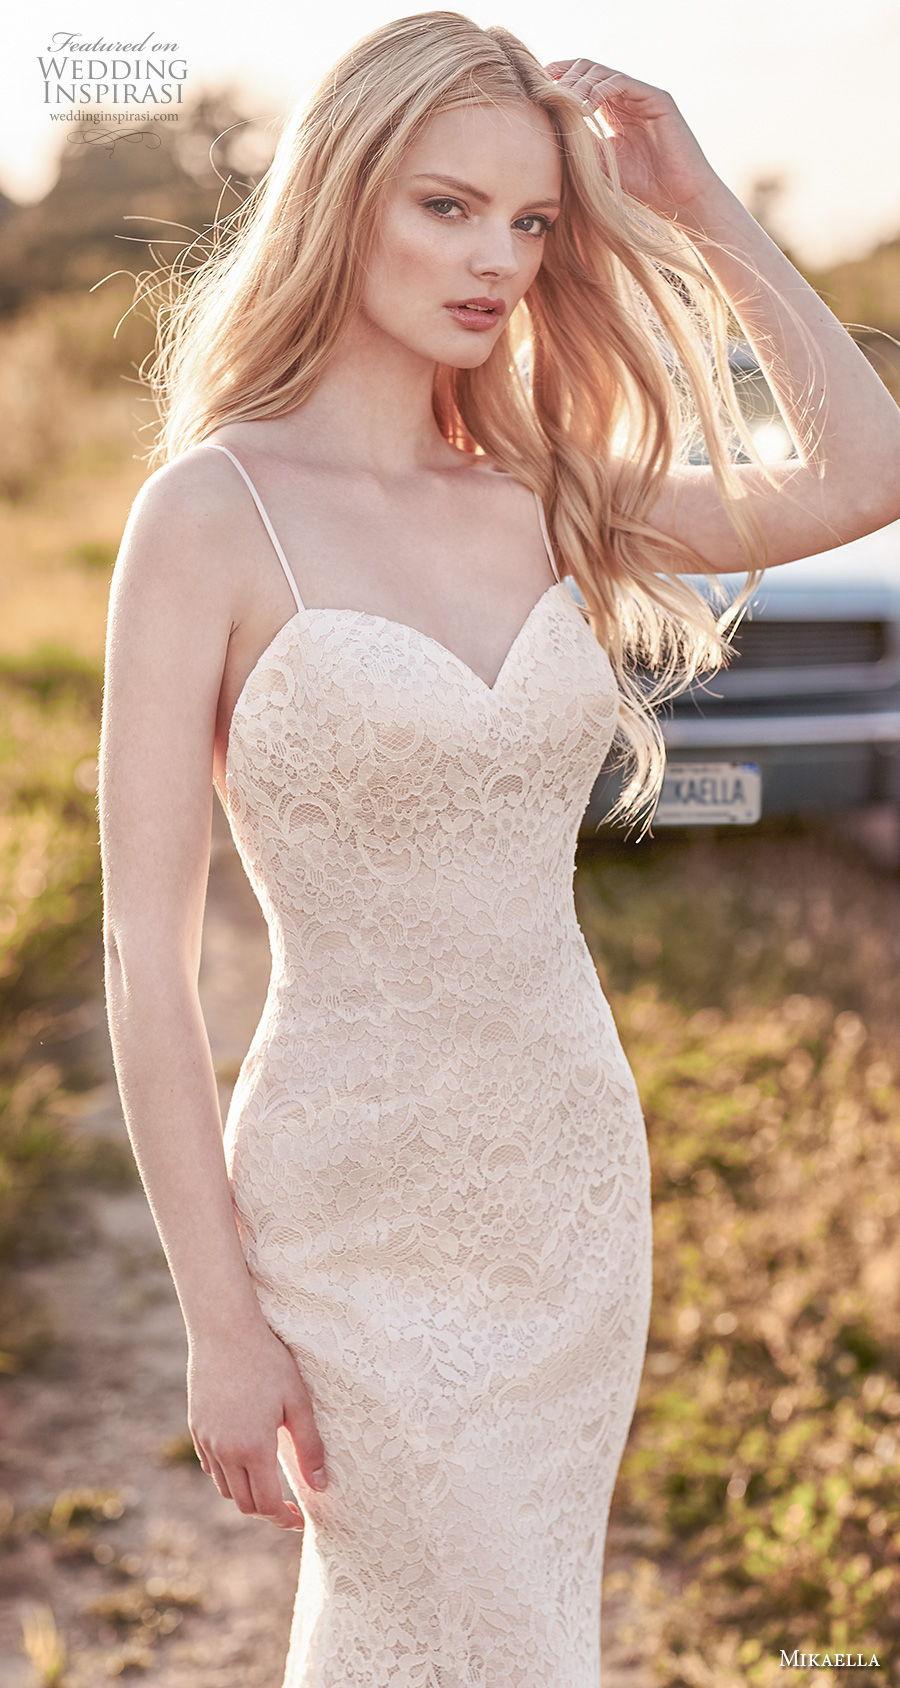 mikaella spring 2020 bridal spaghetti strap sweetheart neckline full embellishment elegant fit and flare sheath wedding dress backless low back short train (7) zv